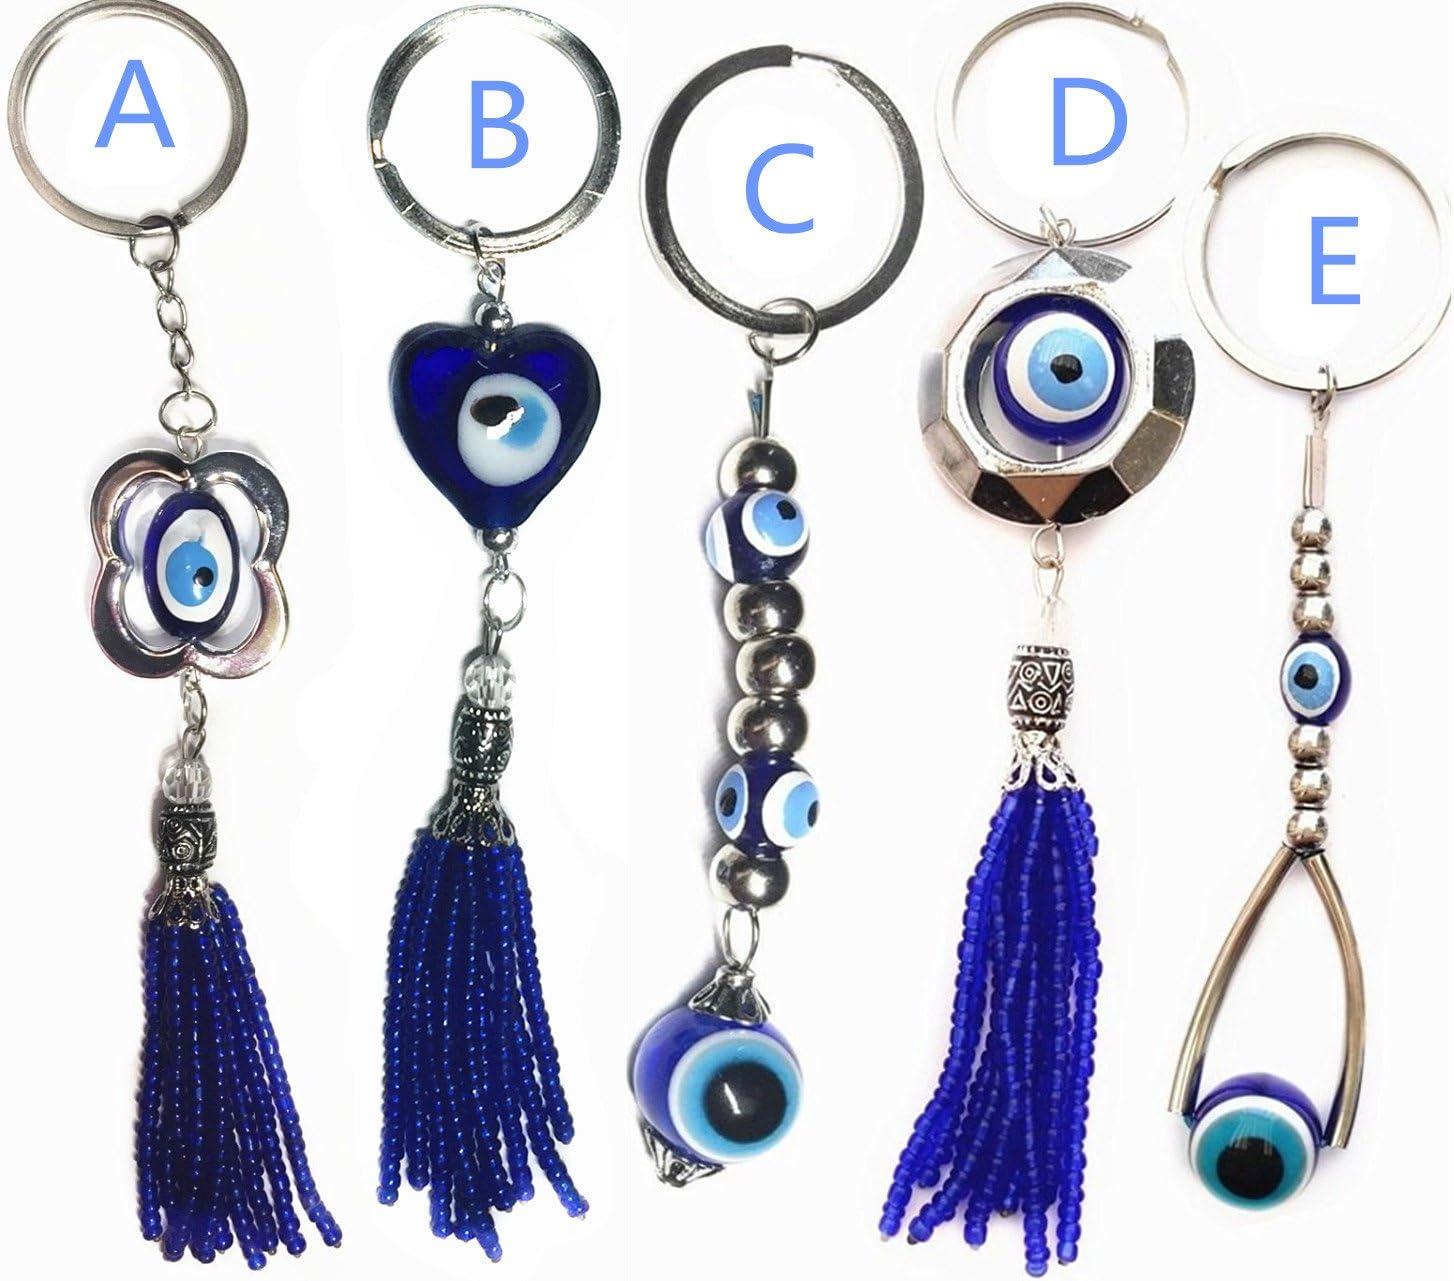 Blue Evil Eye Keychain key ring Hanging Amulet For Protection